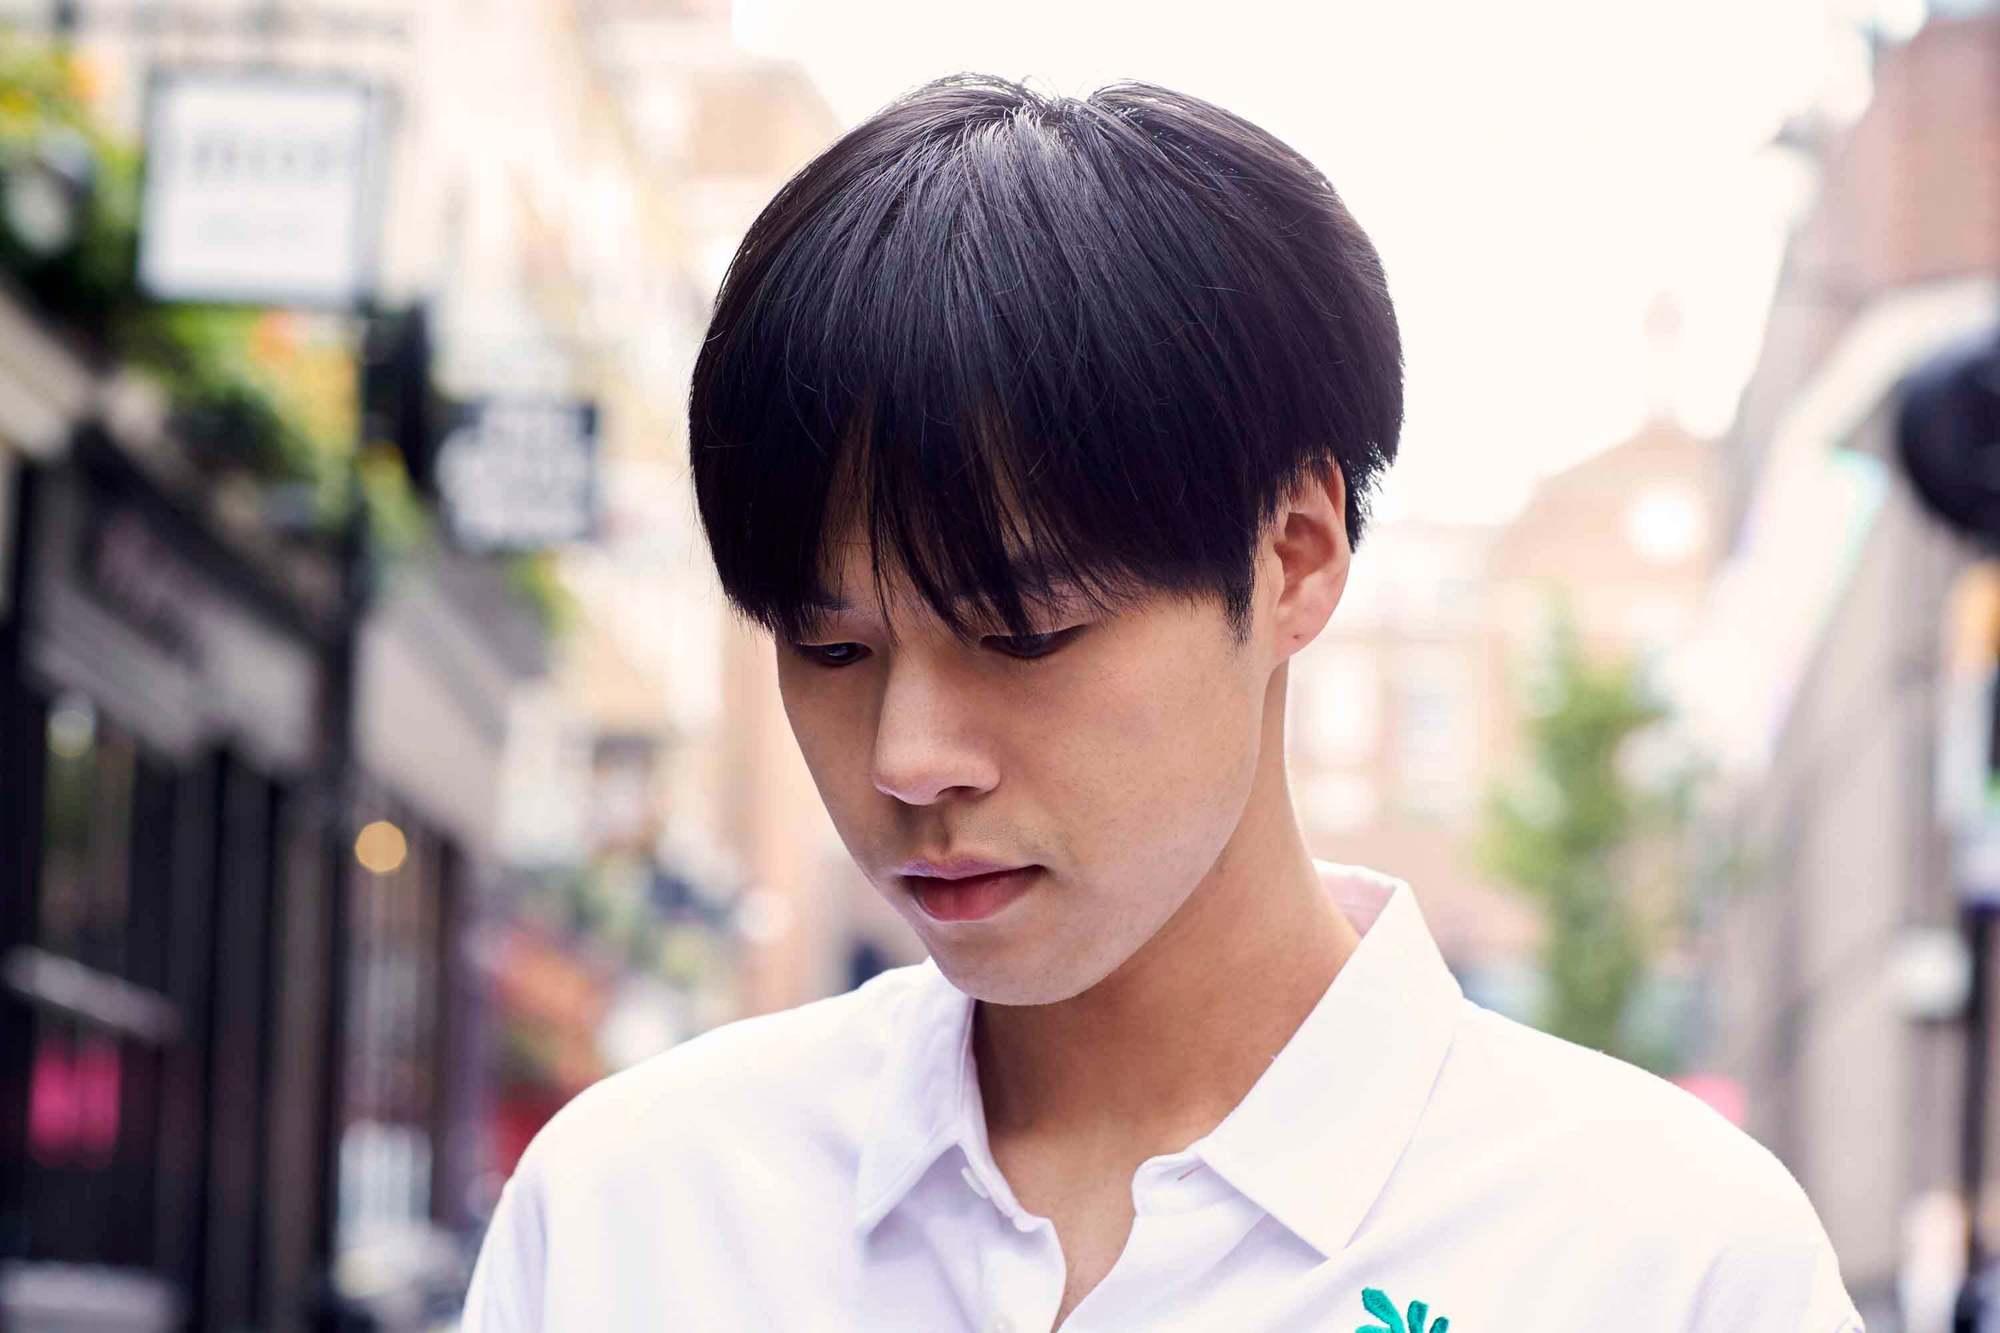 the mushroom haircut on straight asian men's hair